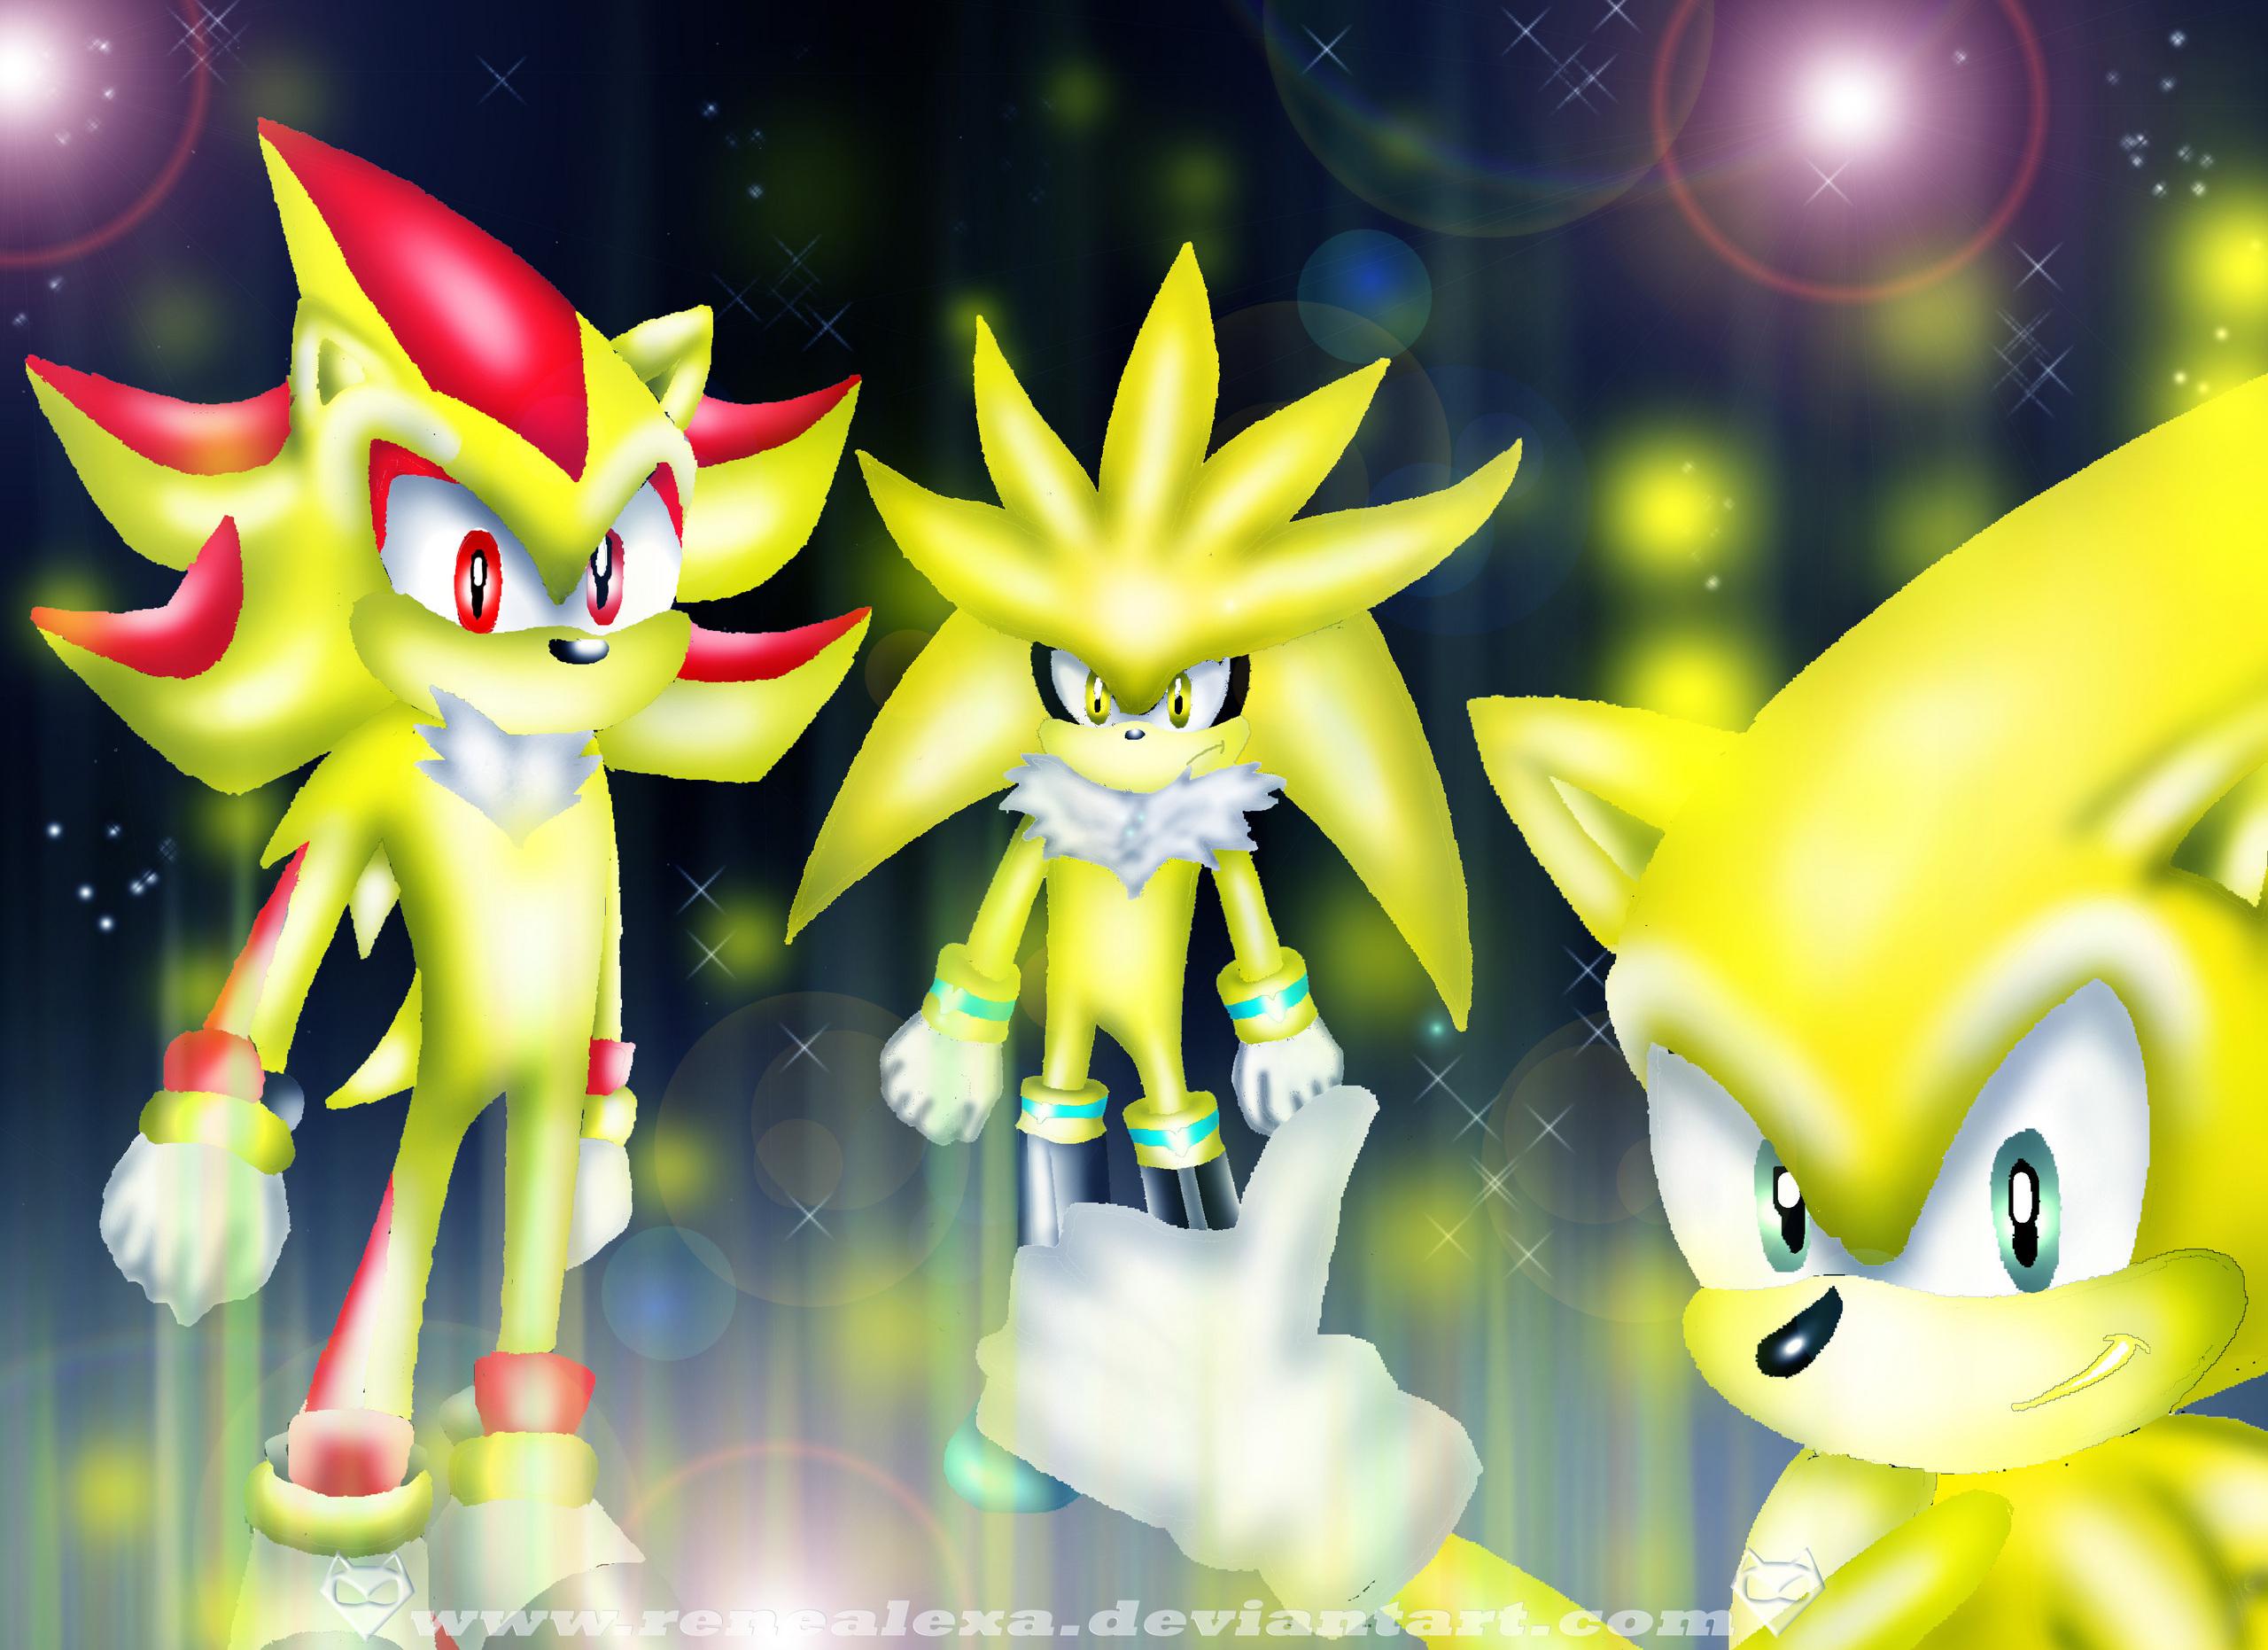 The three Super Hedgehog's - Sonic the Hedgehog Photo ...